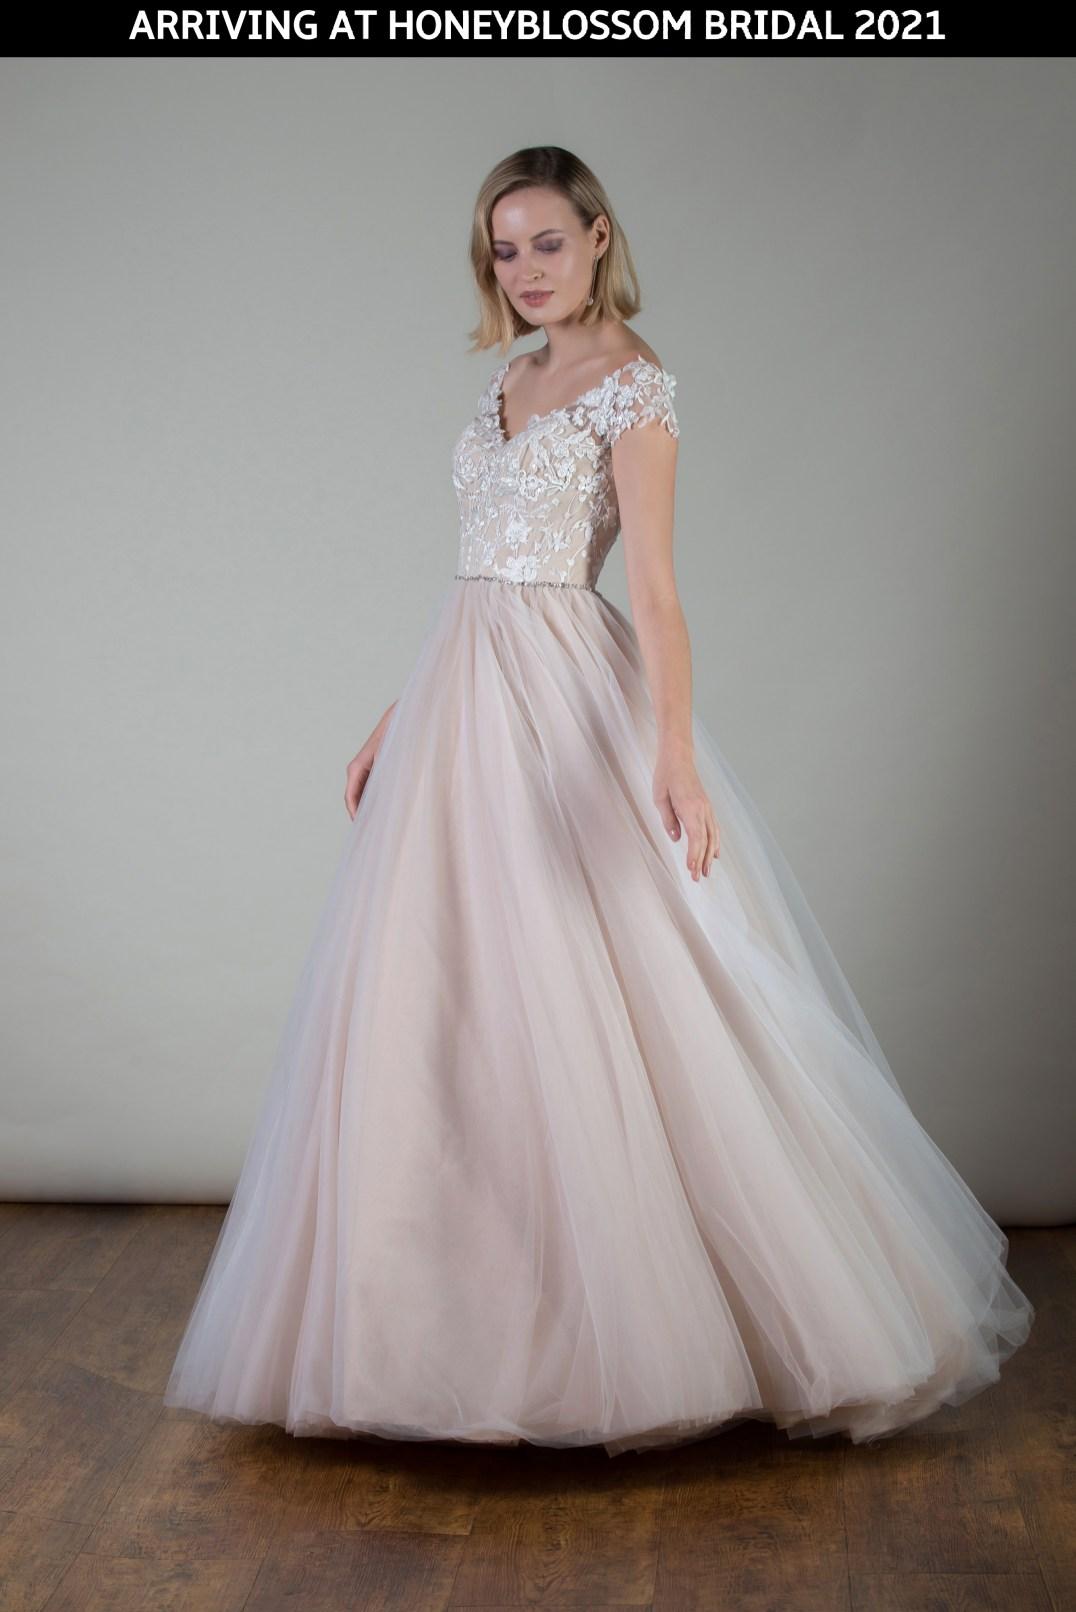 MiaMia Ashlyn wedding dress arriving soon to Honeyblossom Bridal